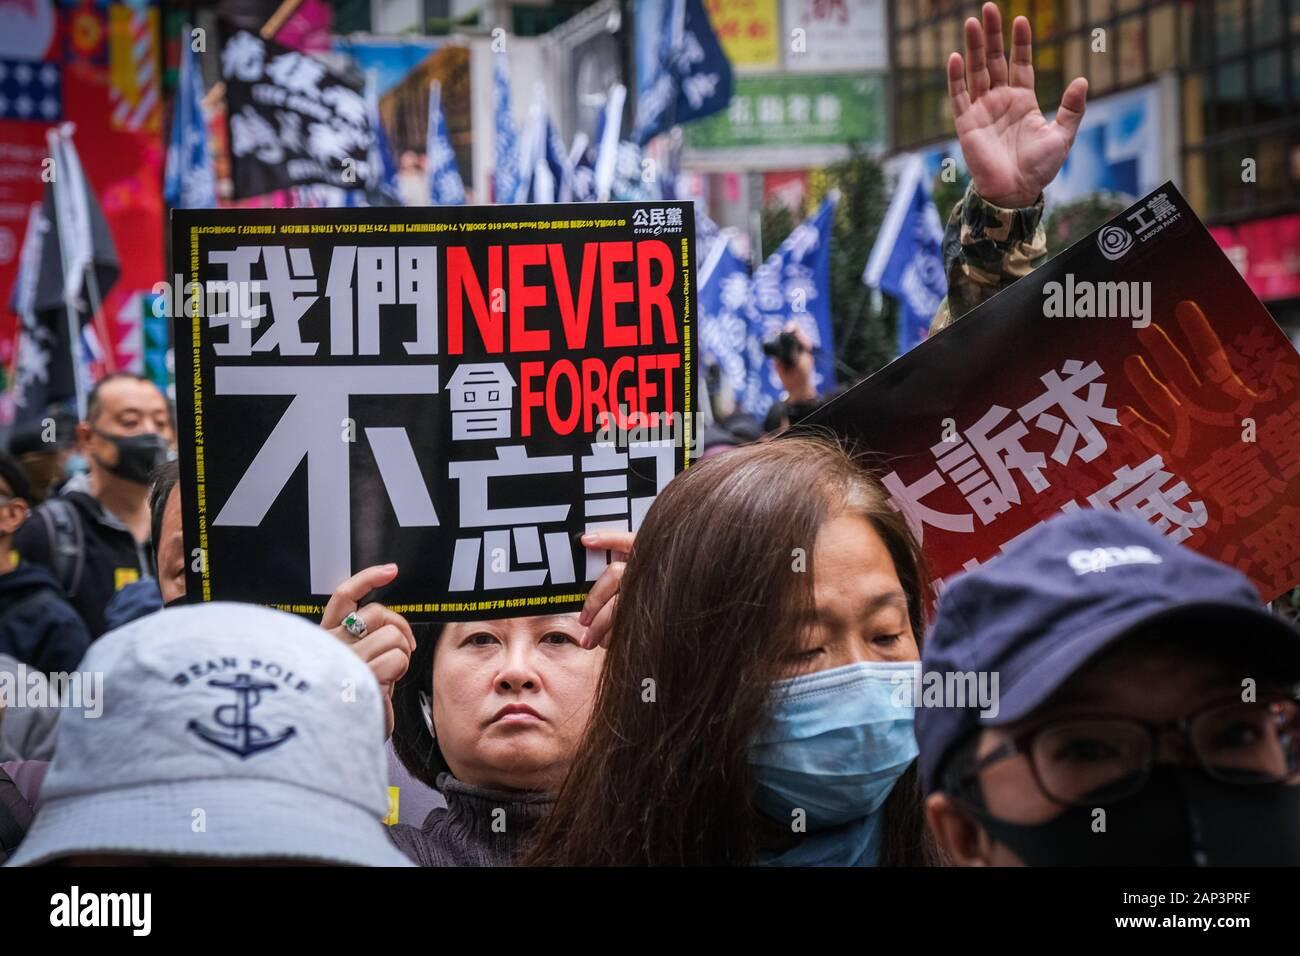 HONG KONG, CHINA - JANUARY 1: Protest against government for new year day, in Hong Kong on January 1, 2020 in Hong Kong, China. Stock Photo